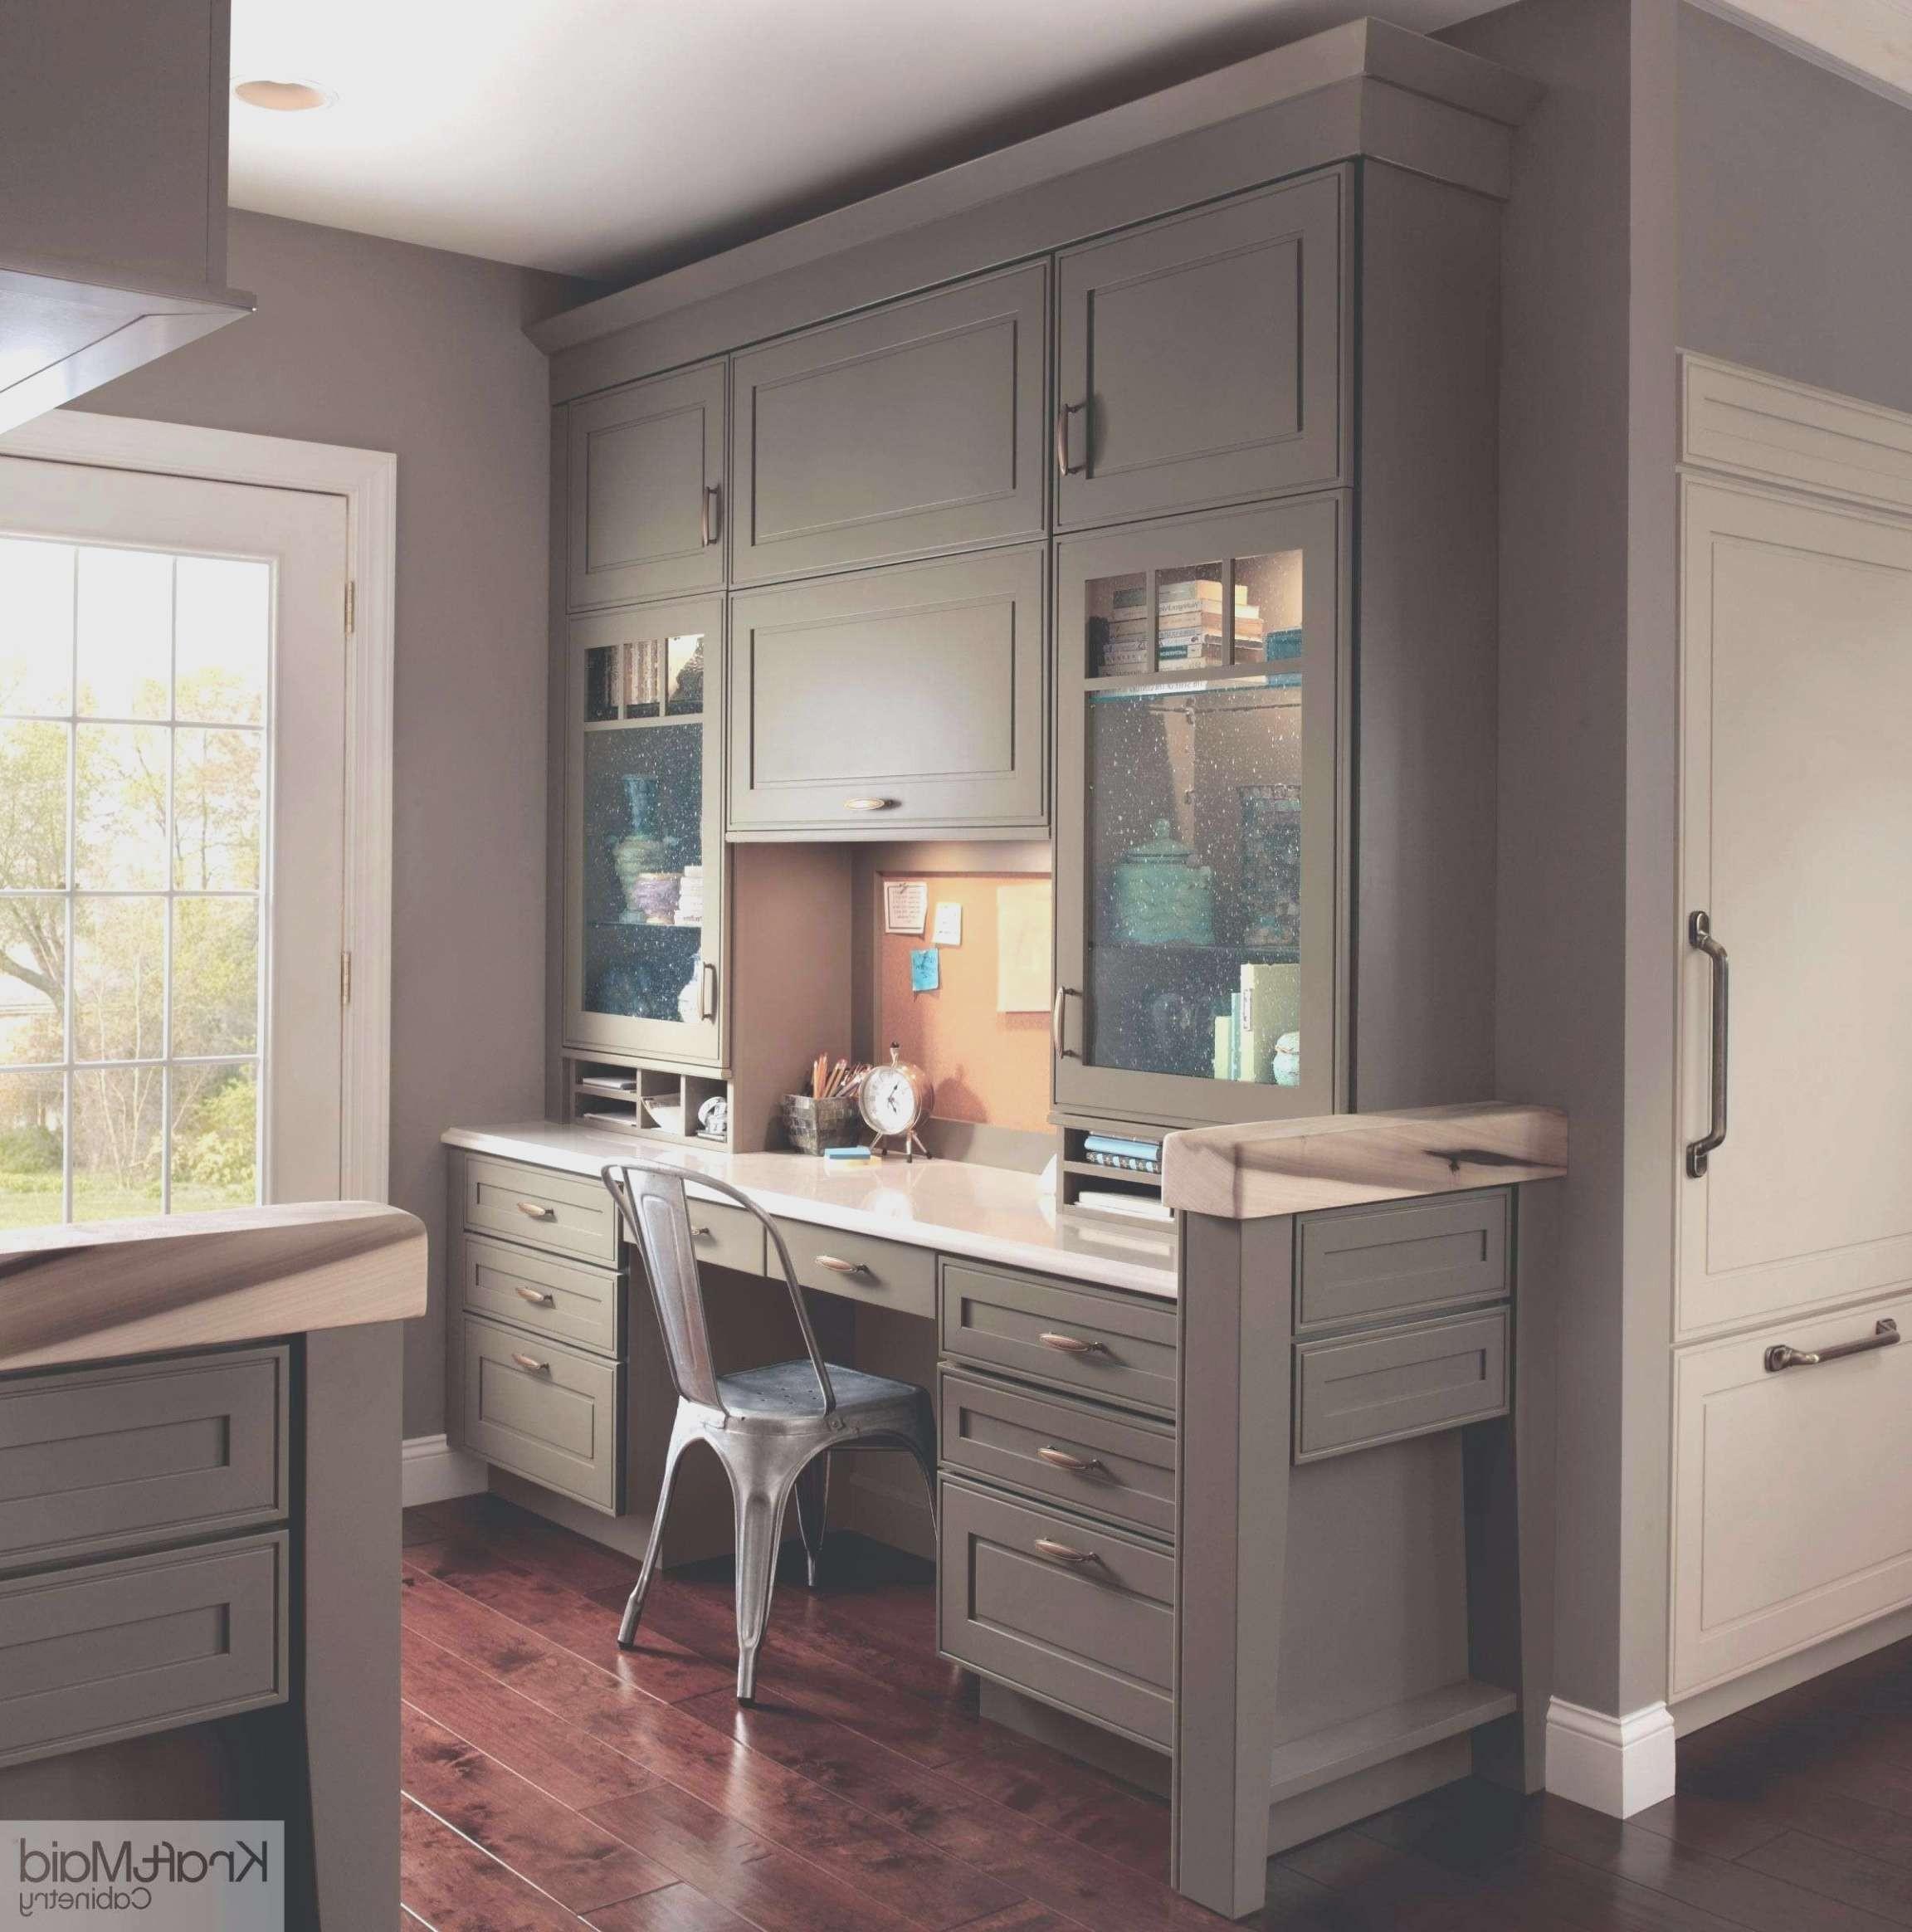 hardwood floor refinishing ri of beautiful discount kitchen cabinets rhode island ideas within 21 elegant kitchen cabinets ideas of discount kitchen cabinets rhode island